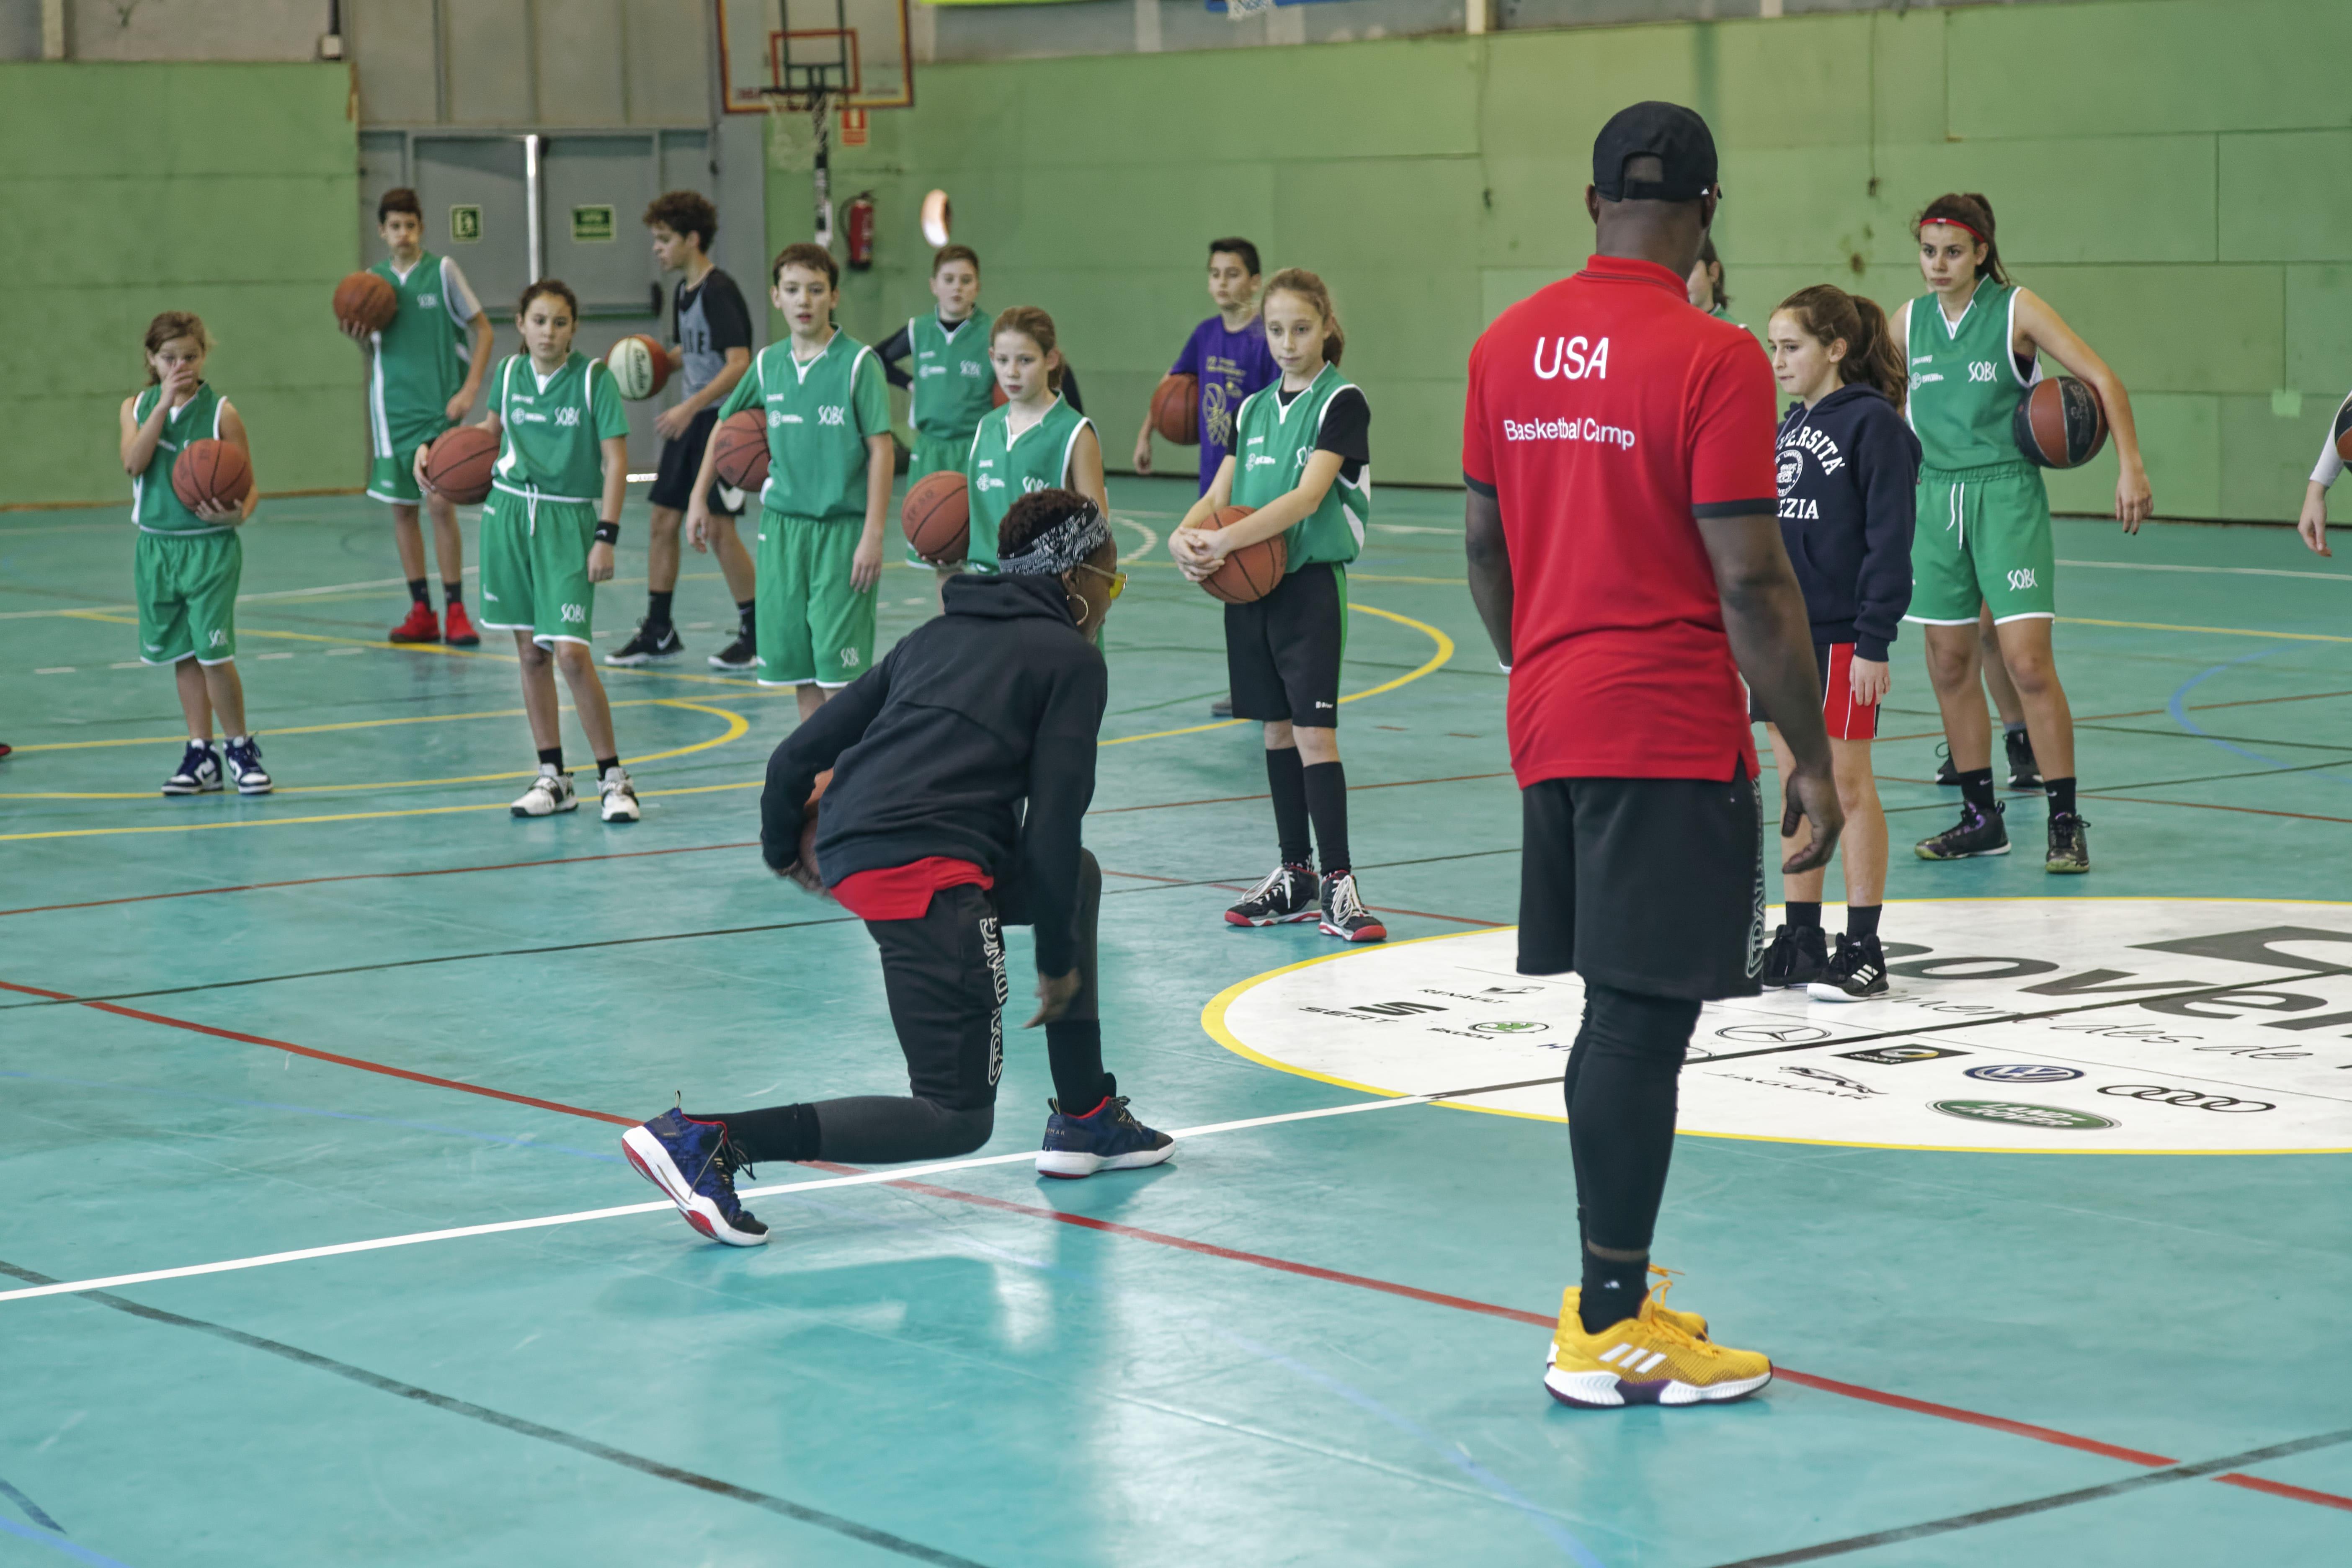 Nba Basket Campus Barcelona